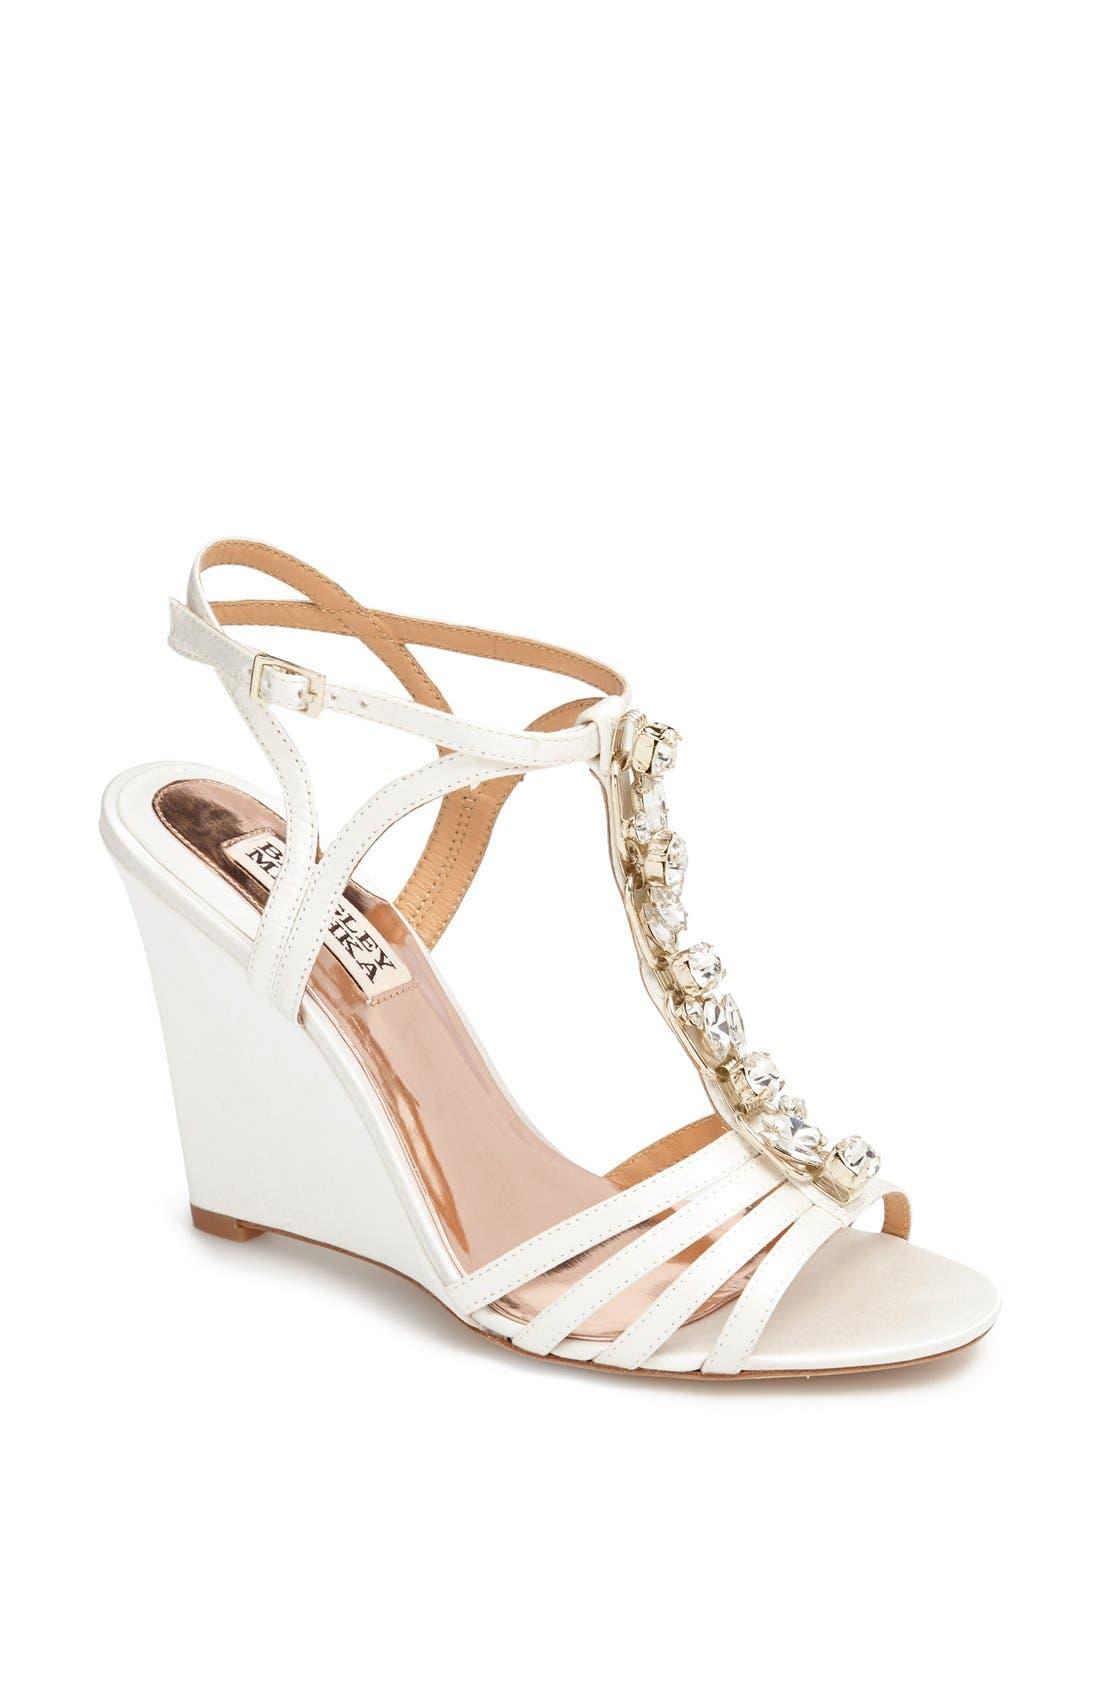 Main Image - Badgley Mischka 'Kole' T-Strap Wedge Sandal